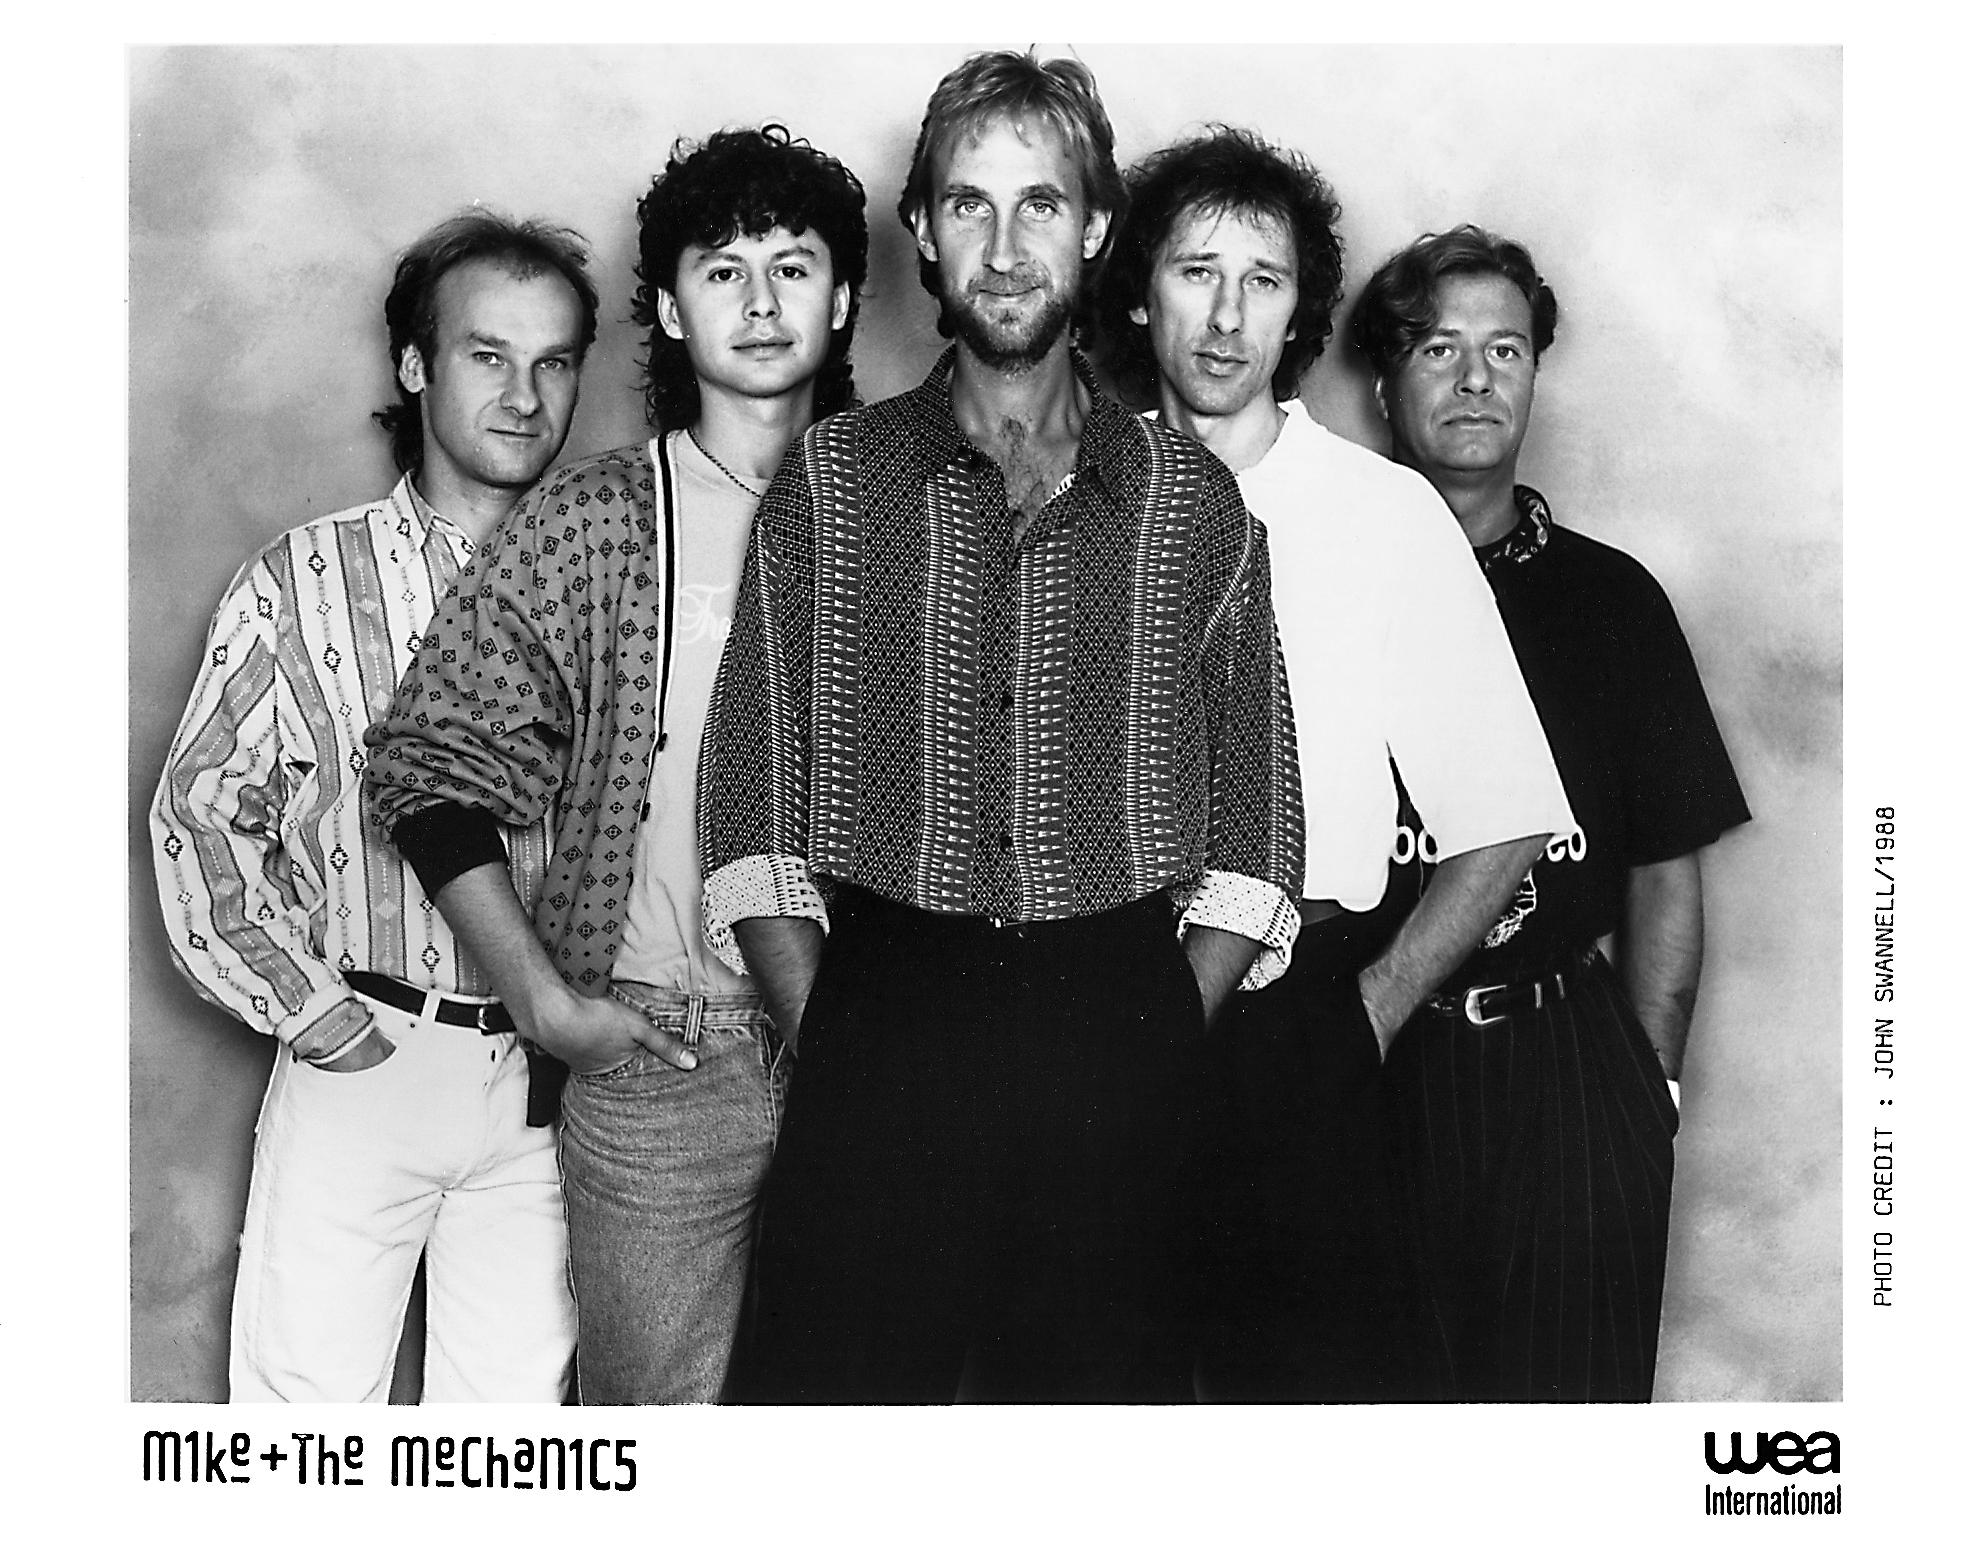 Mike and The Mechanics M1ke + The Mechan1c5 Living Years